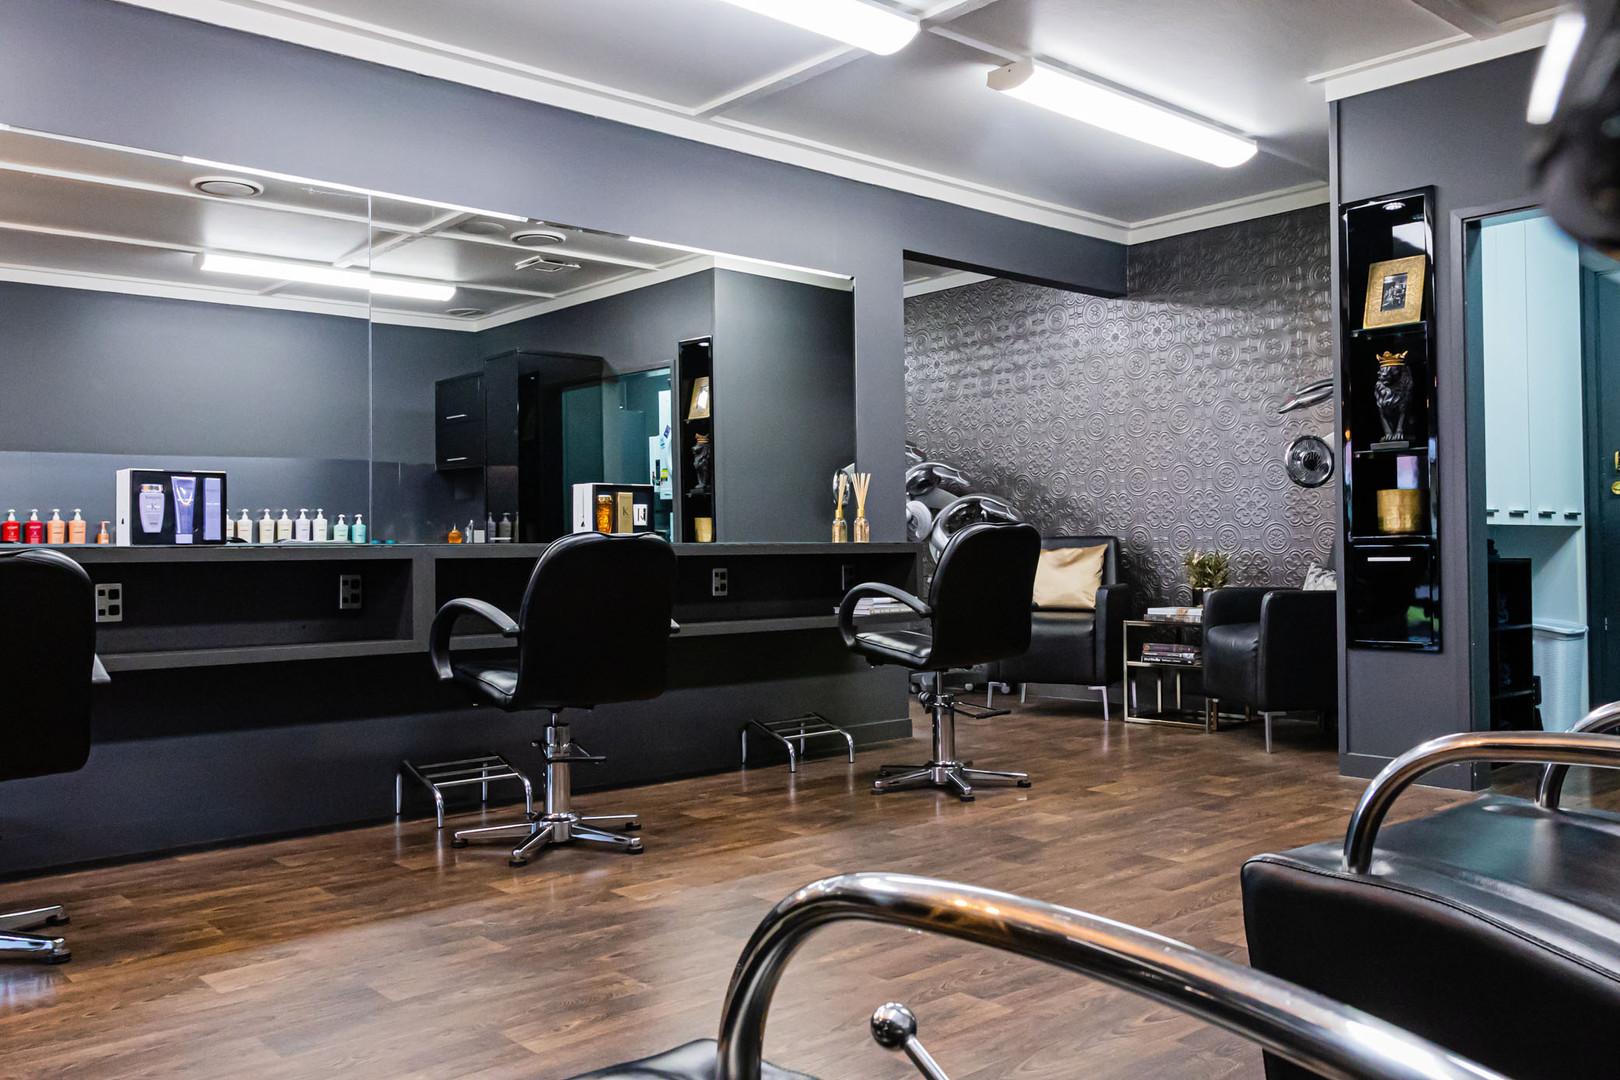 veronica-jayne-salon-selects_AKRU2593.jp